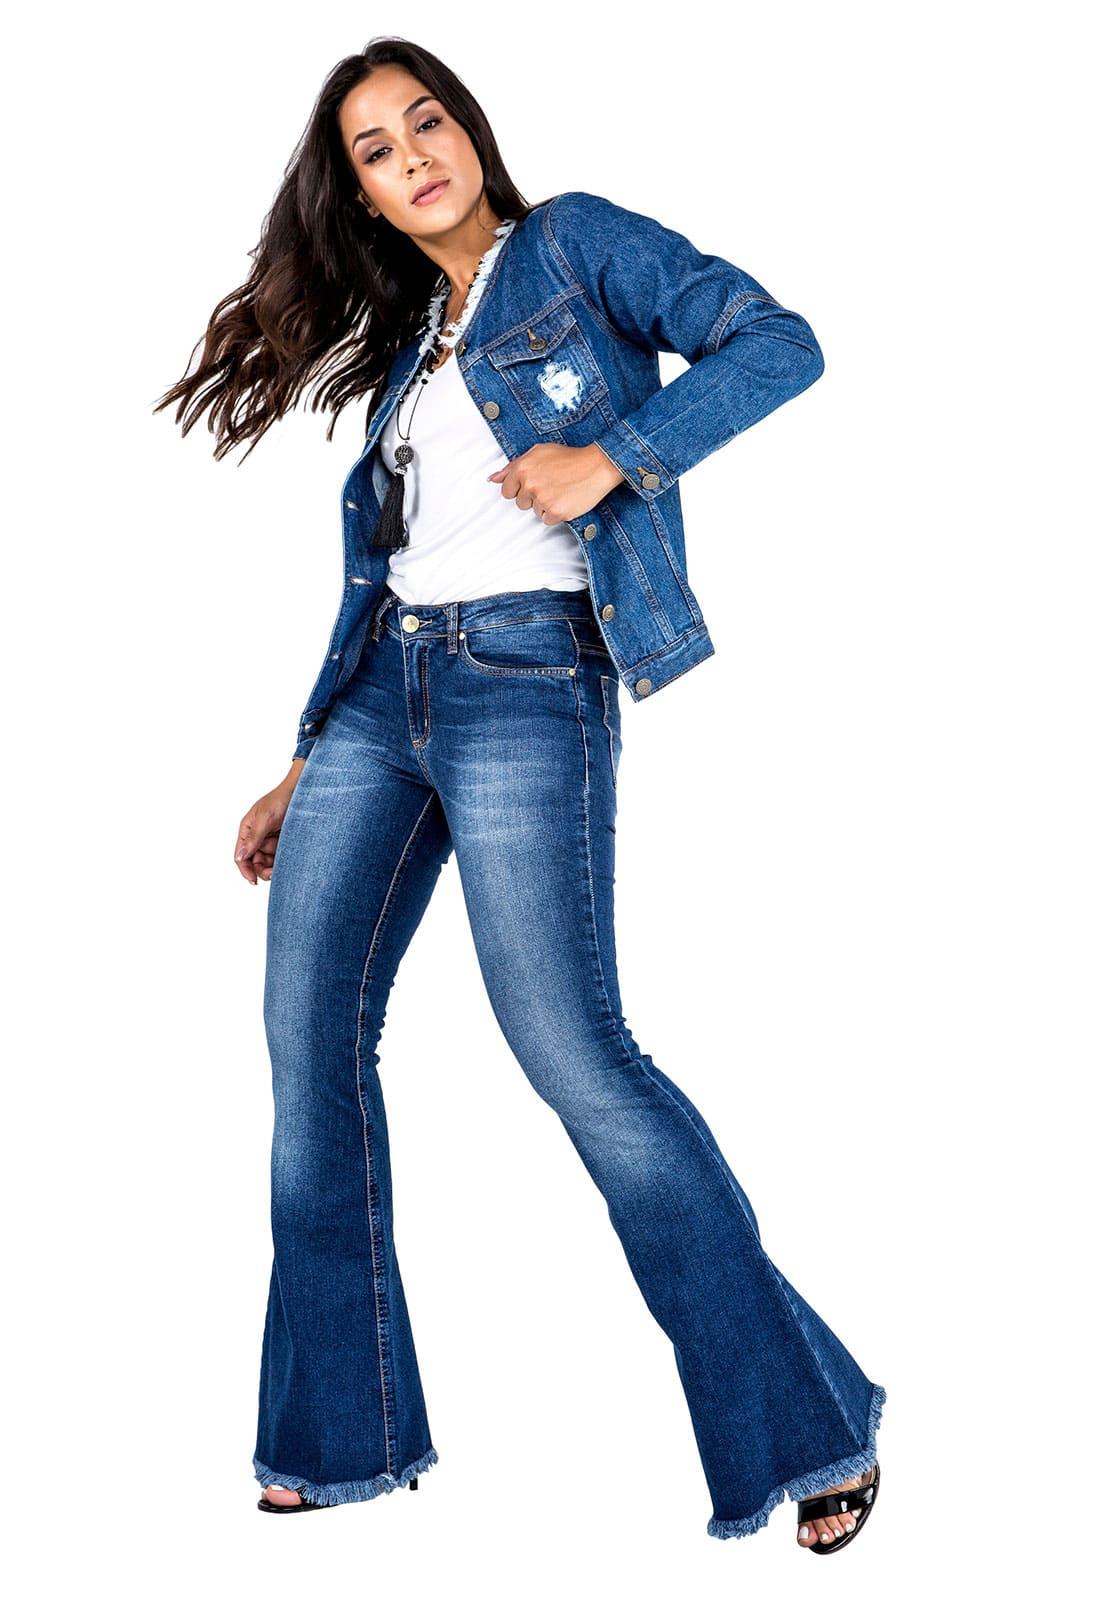 Calça Jeans Feminina Tradicional Sino